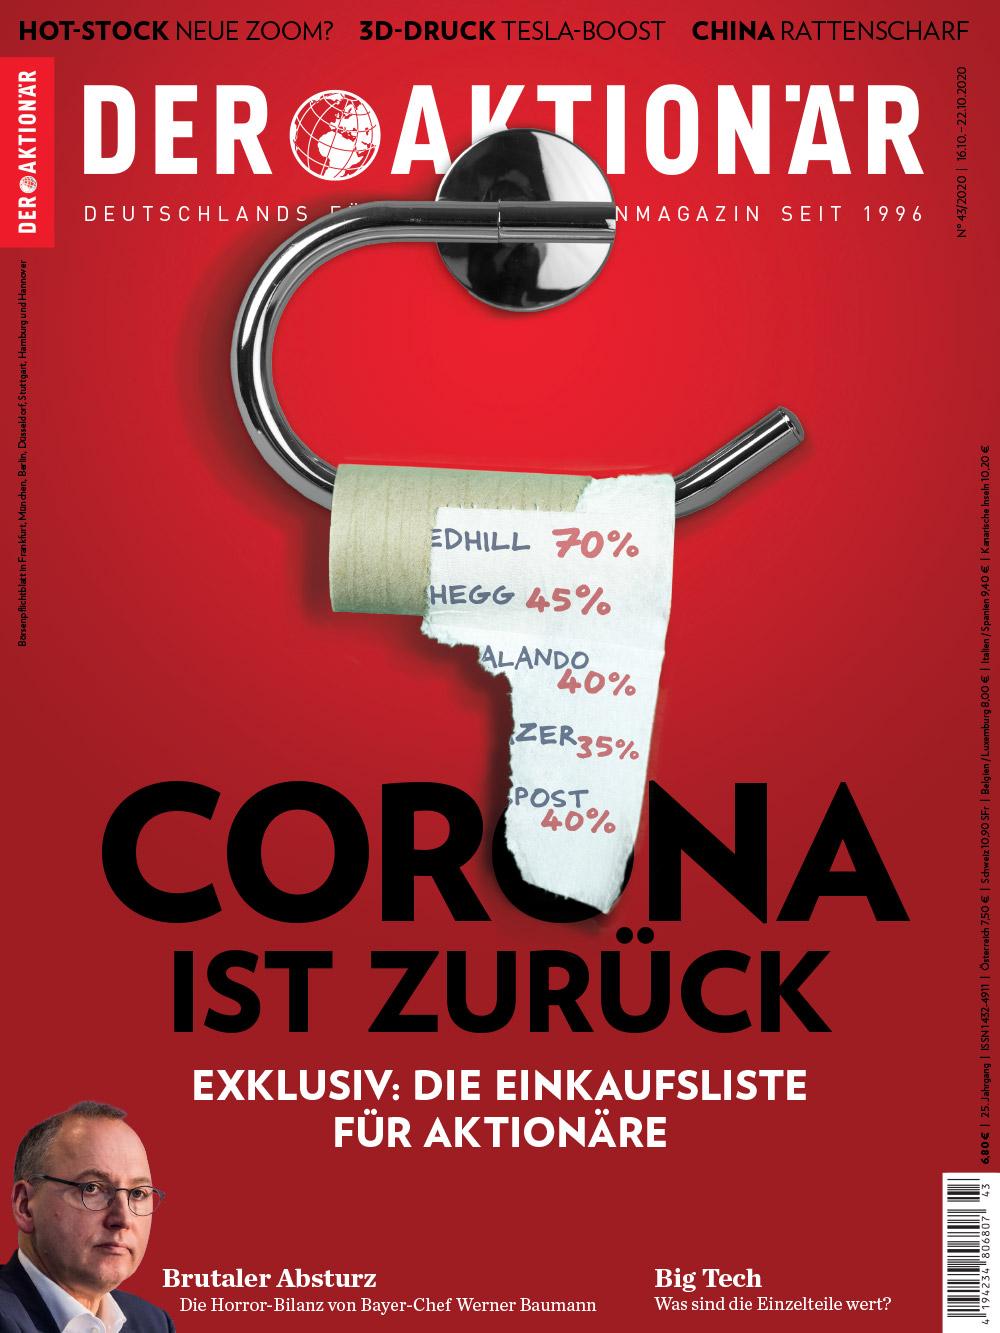 DER AKTIONÄR Oktober 2020: Corona ist zurück